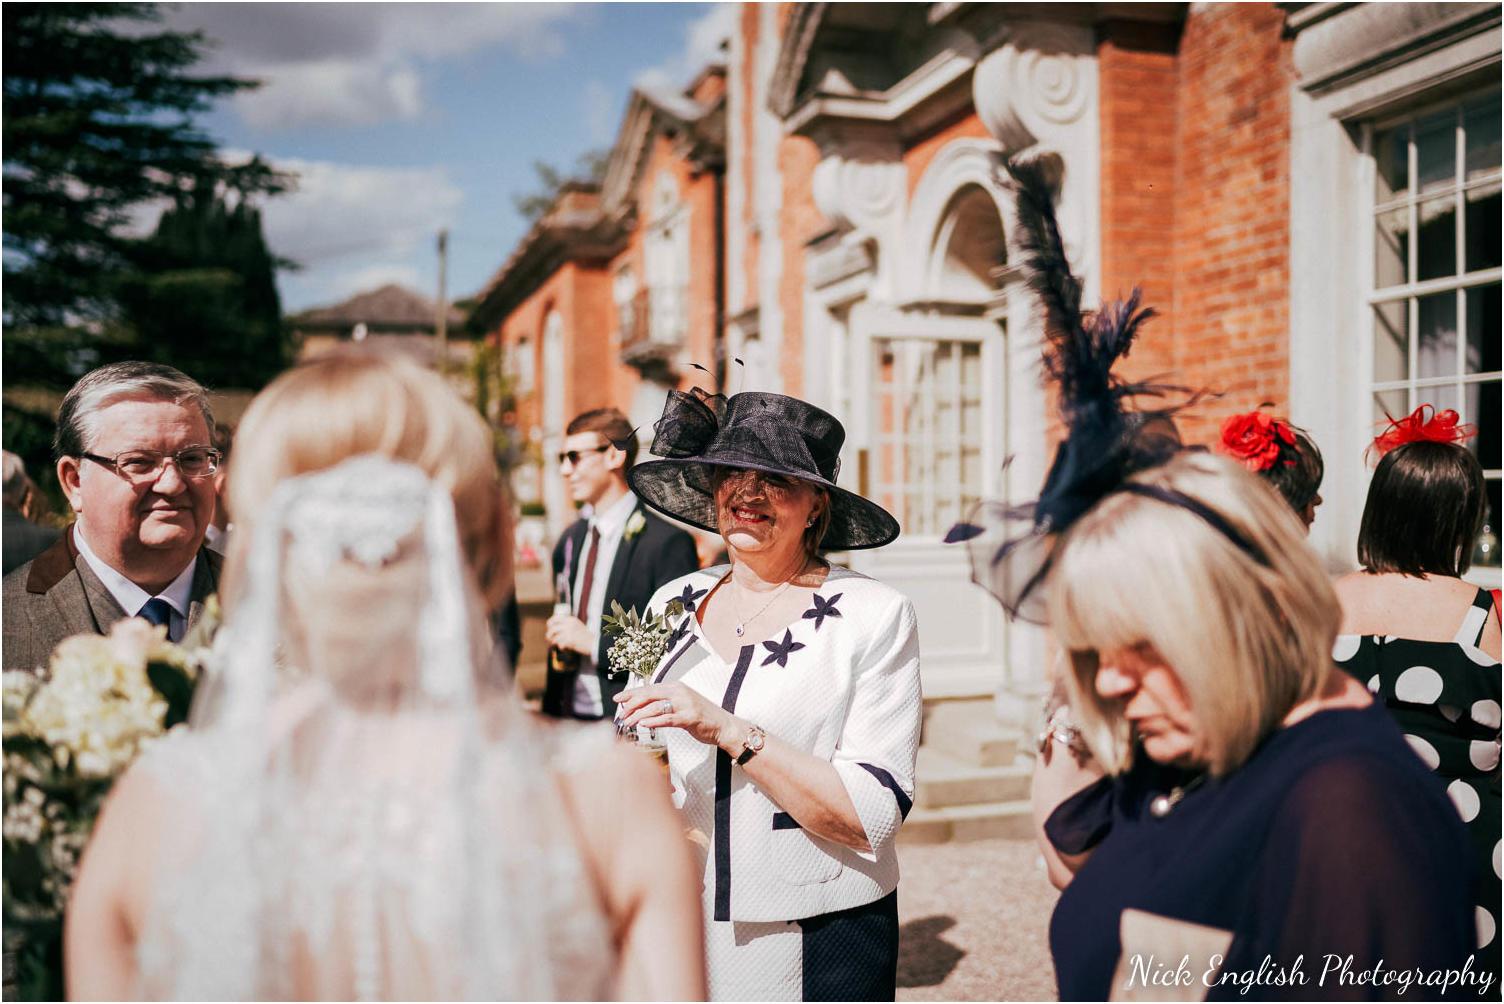 Eaves_Hall_Outdoor_Wedding_Photograph-46.jpg